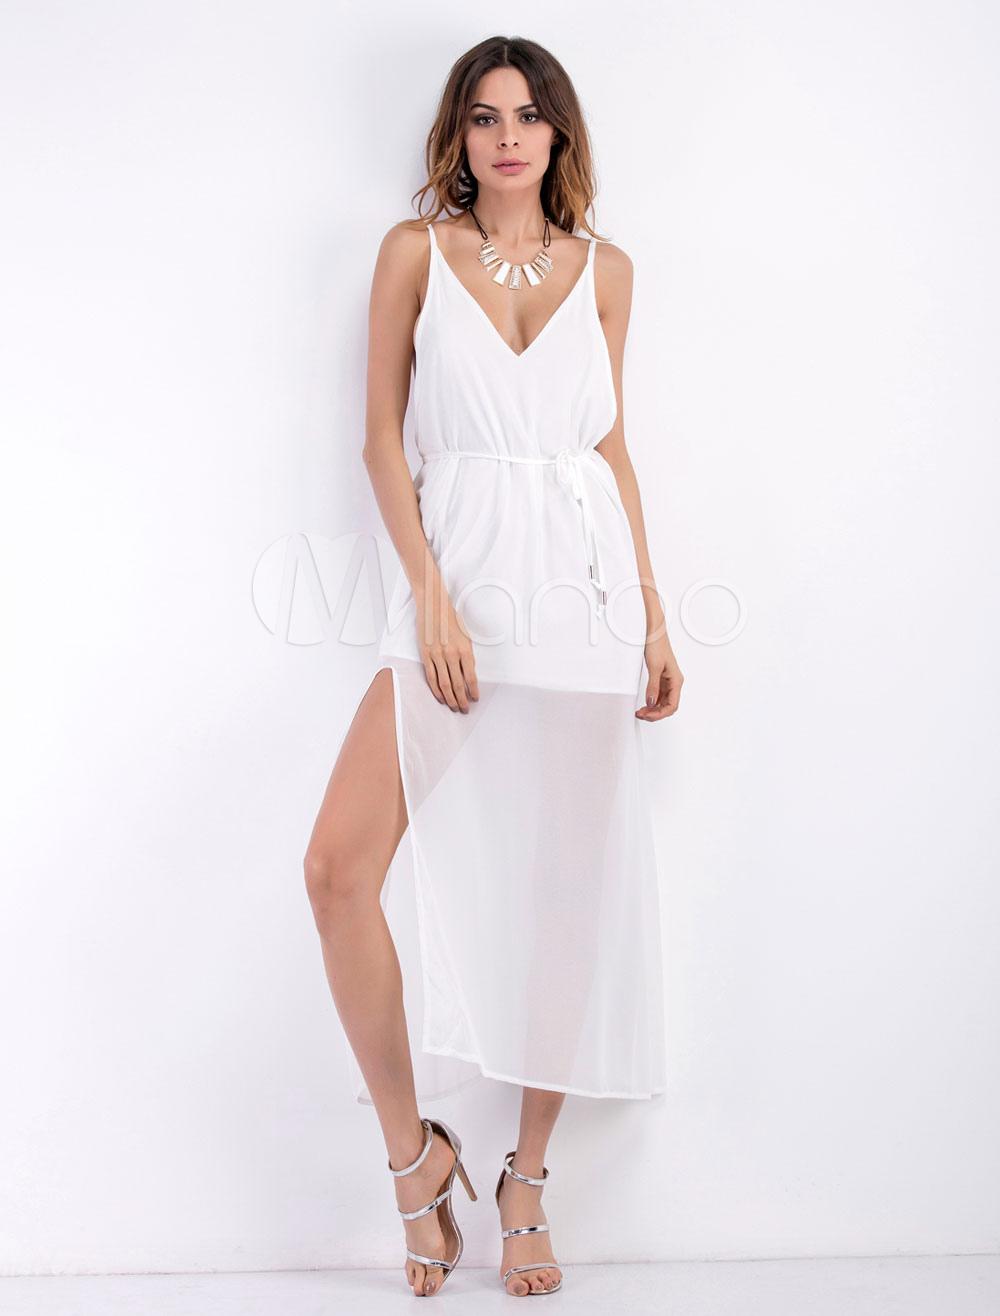 e494166056 ... Gasa V tiras blanco cuello sin mangas semi pura vestido largo para las.  12. -30%. color blanco